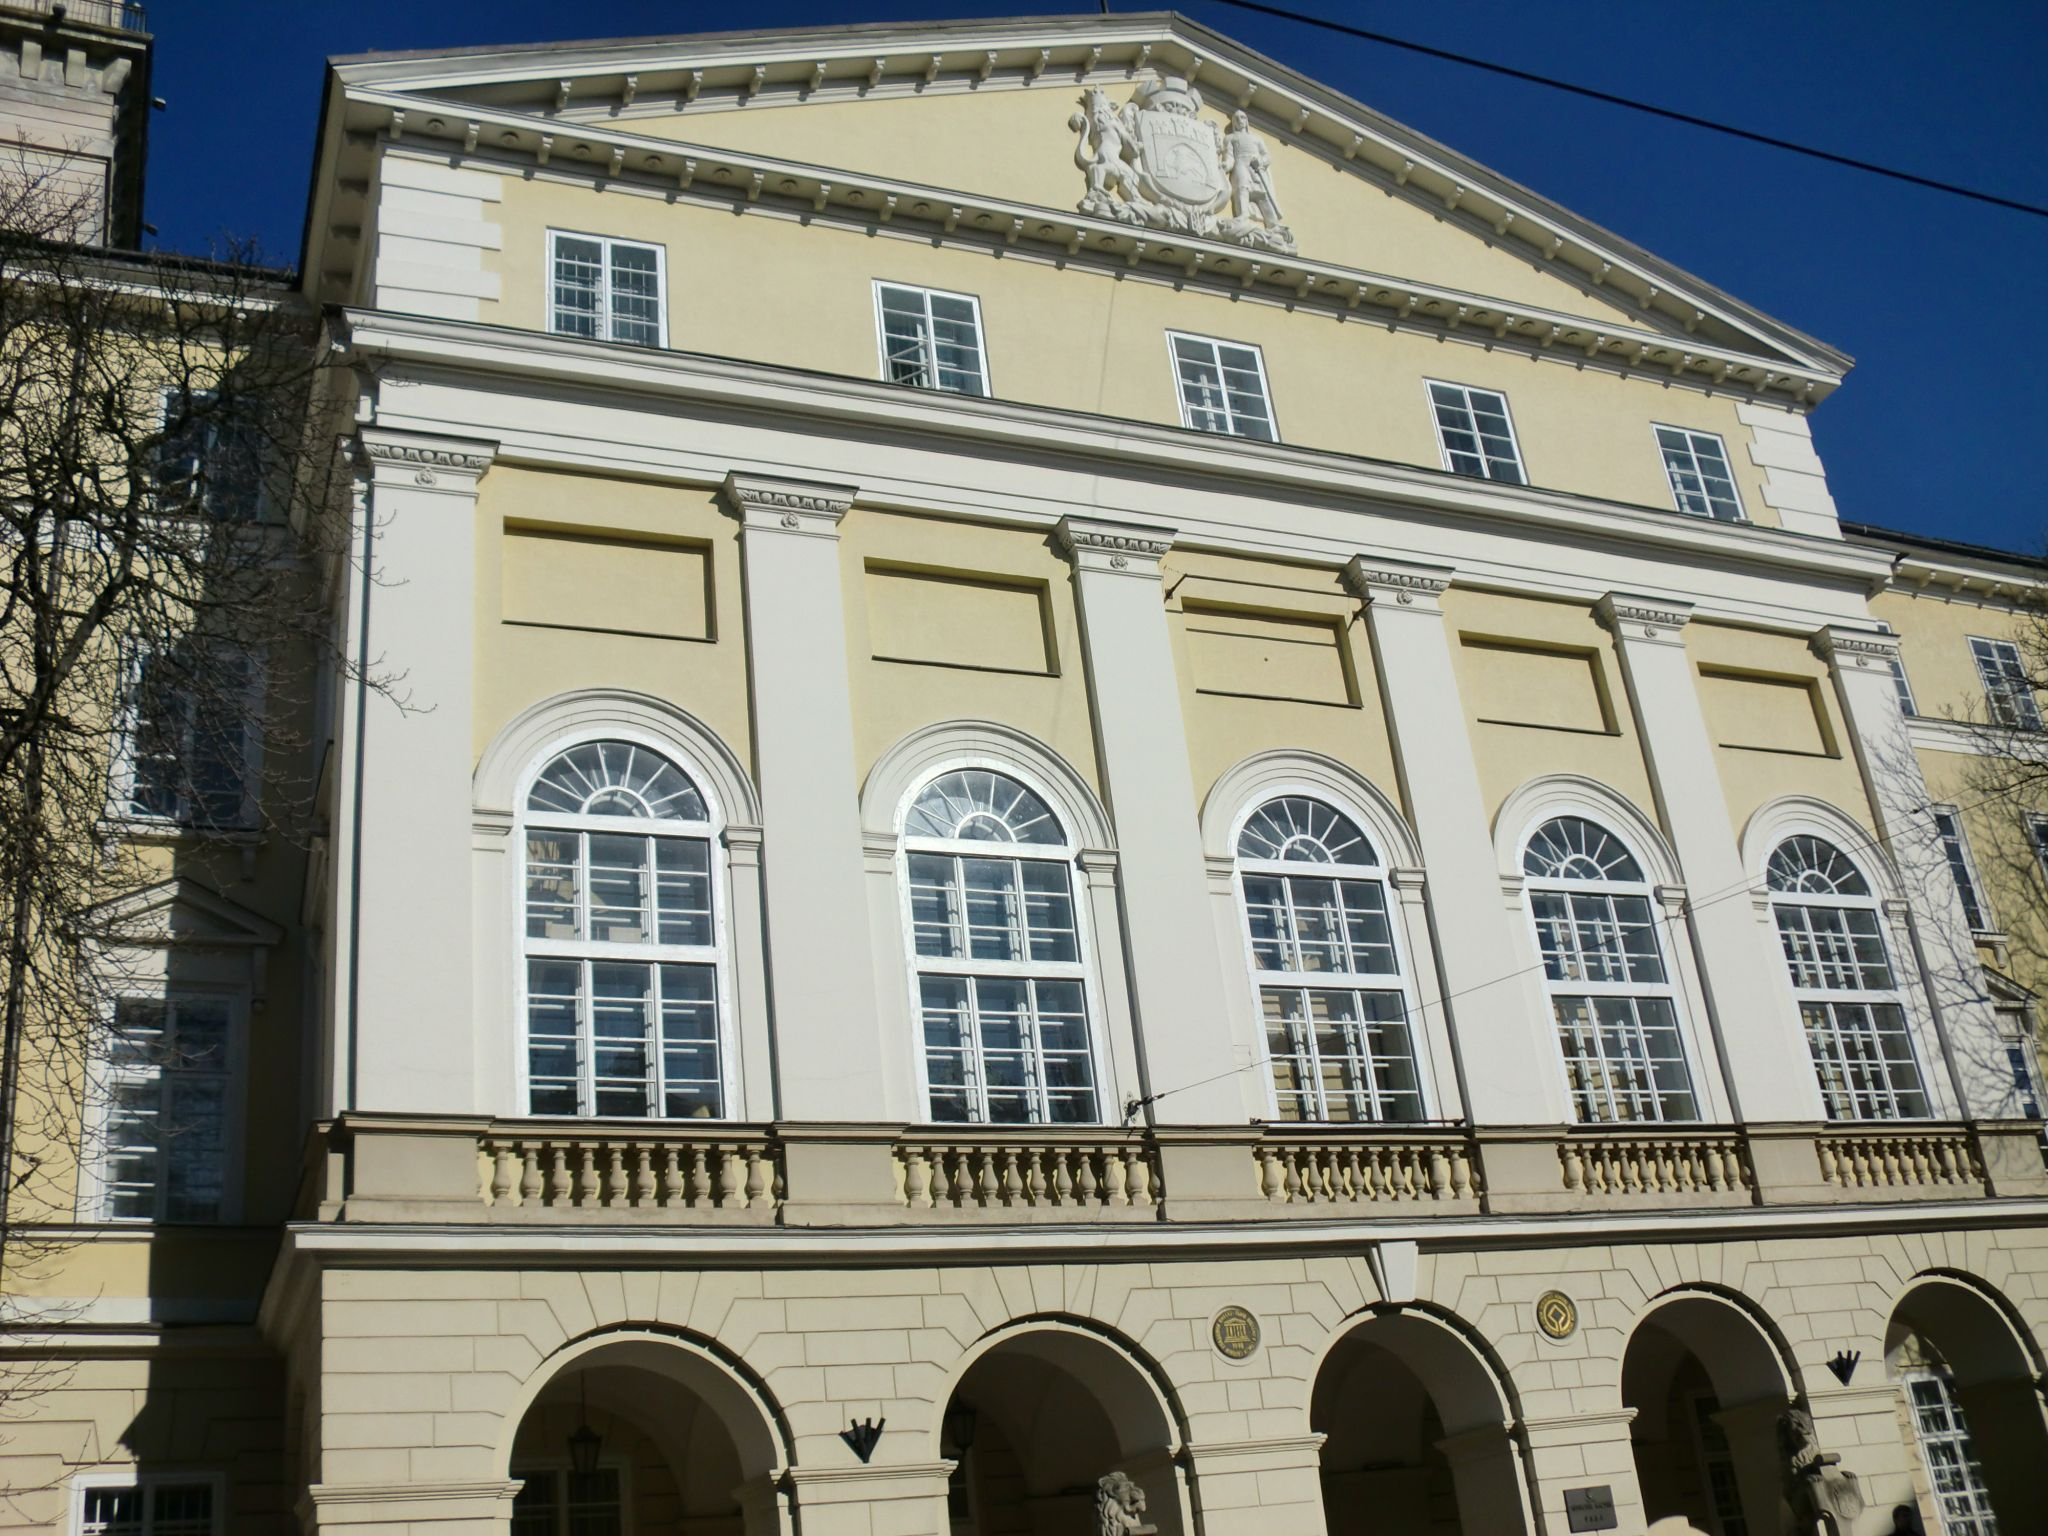 Lviv city hall 1 - Lviv, the Ukrainian pearl